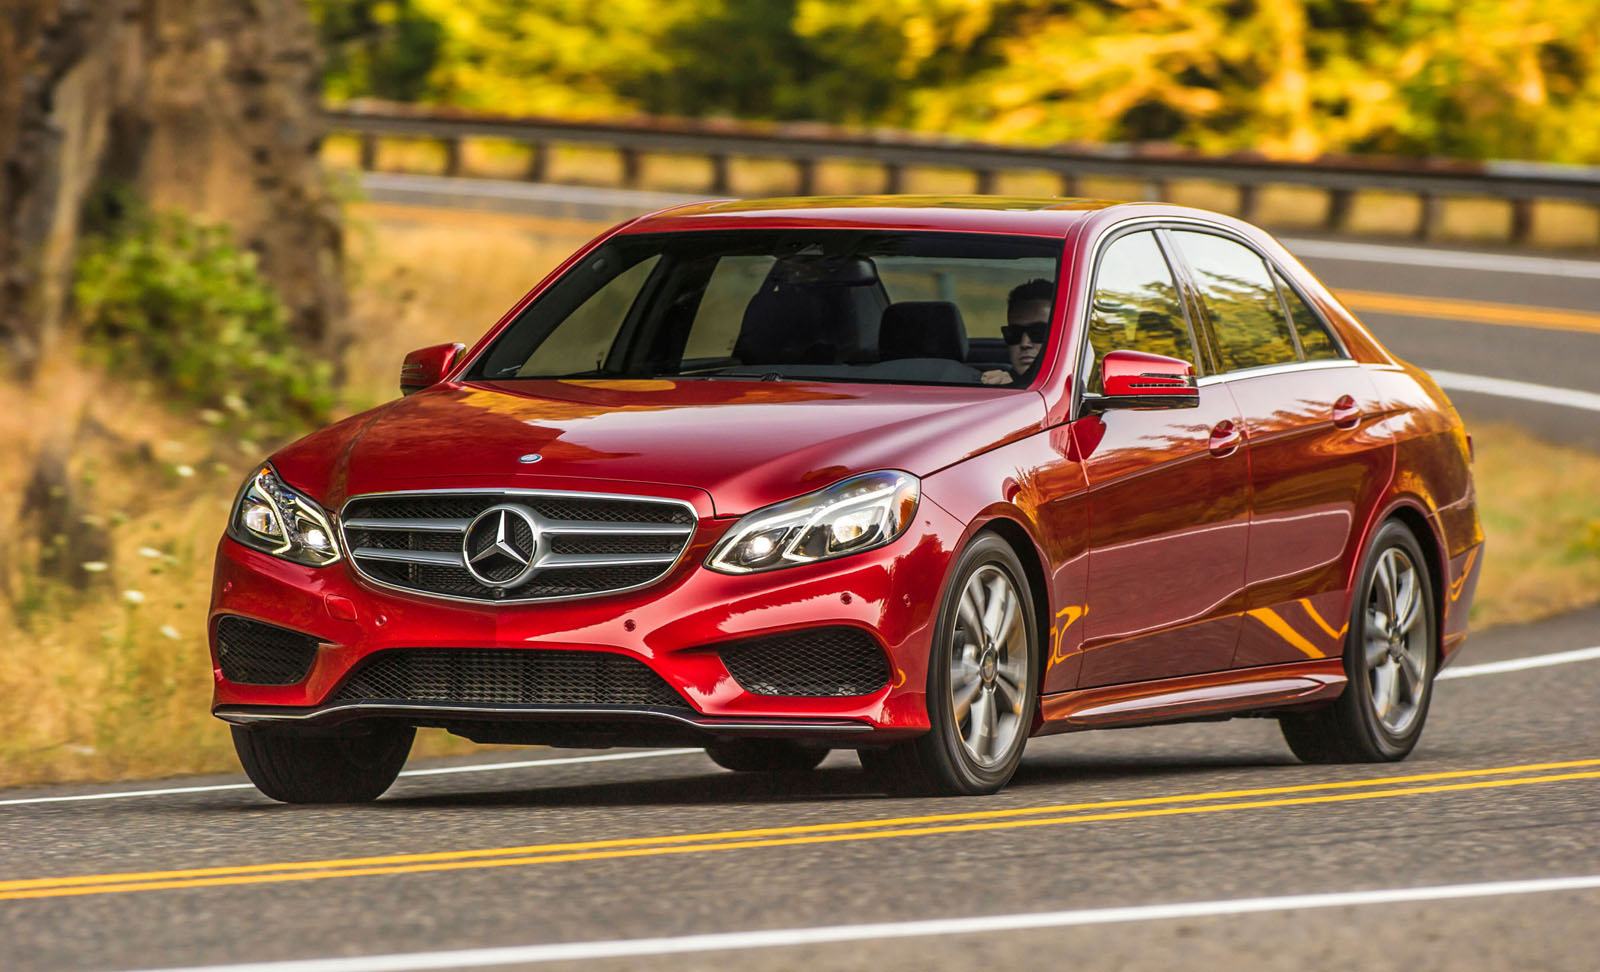 Mercedes benz usa 2014 e250 bluetec mbworld mercedes benz usa 2014 e250 bluetec thecheapjerseys Choice Image